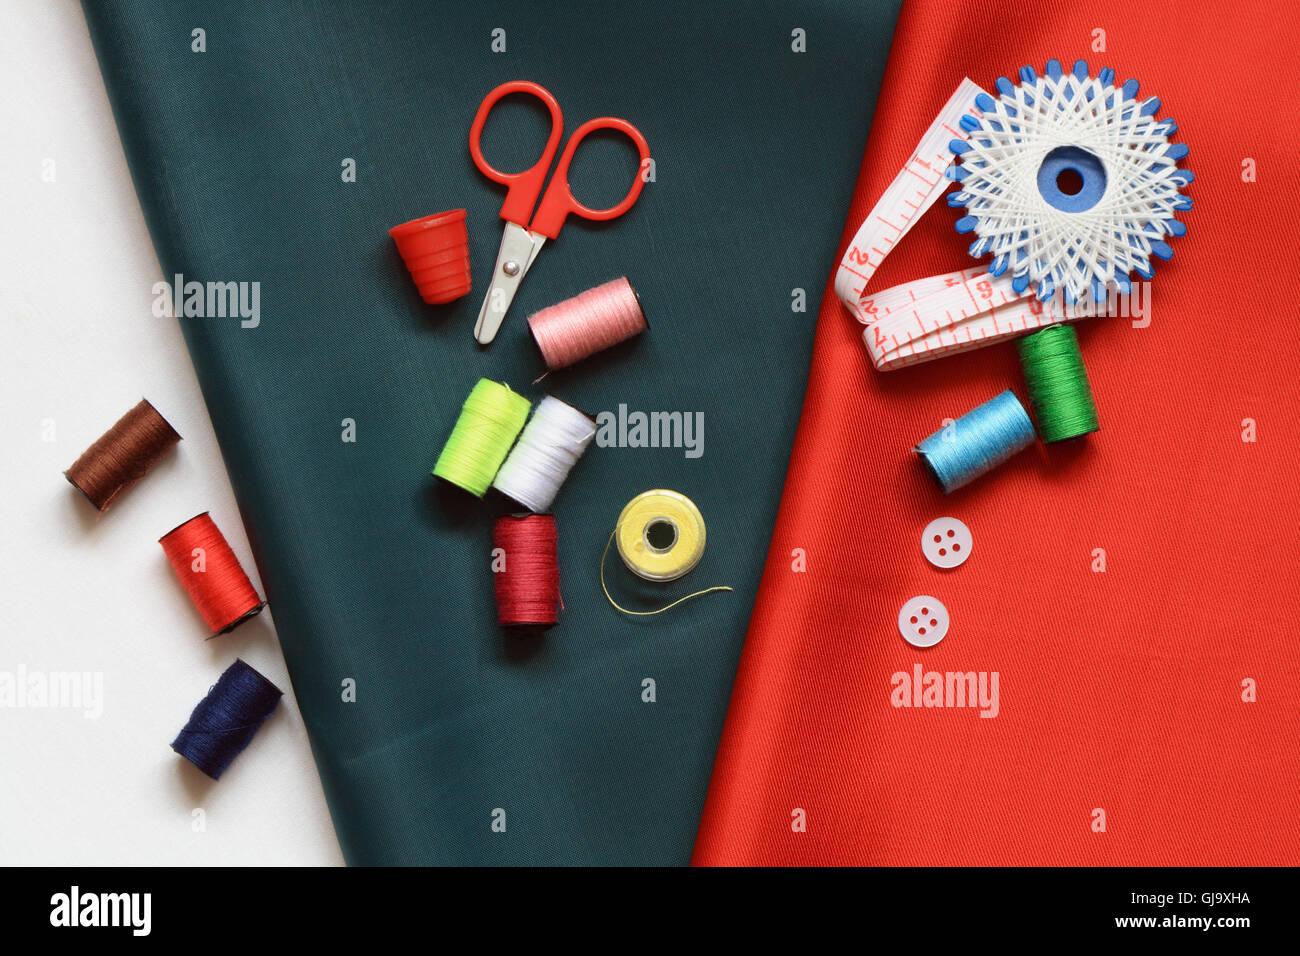 Sewing Item - Stock Image